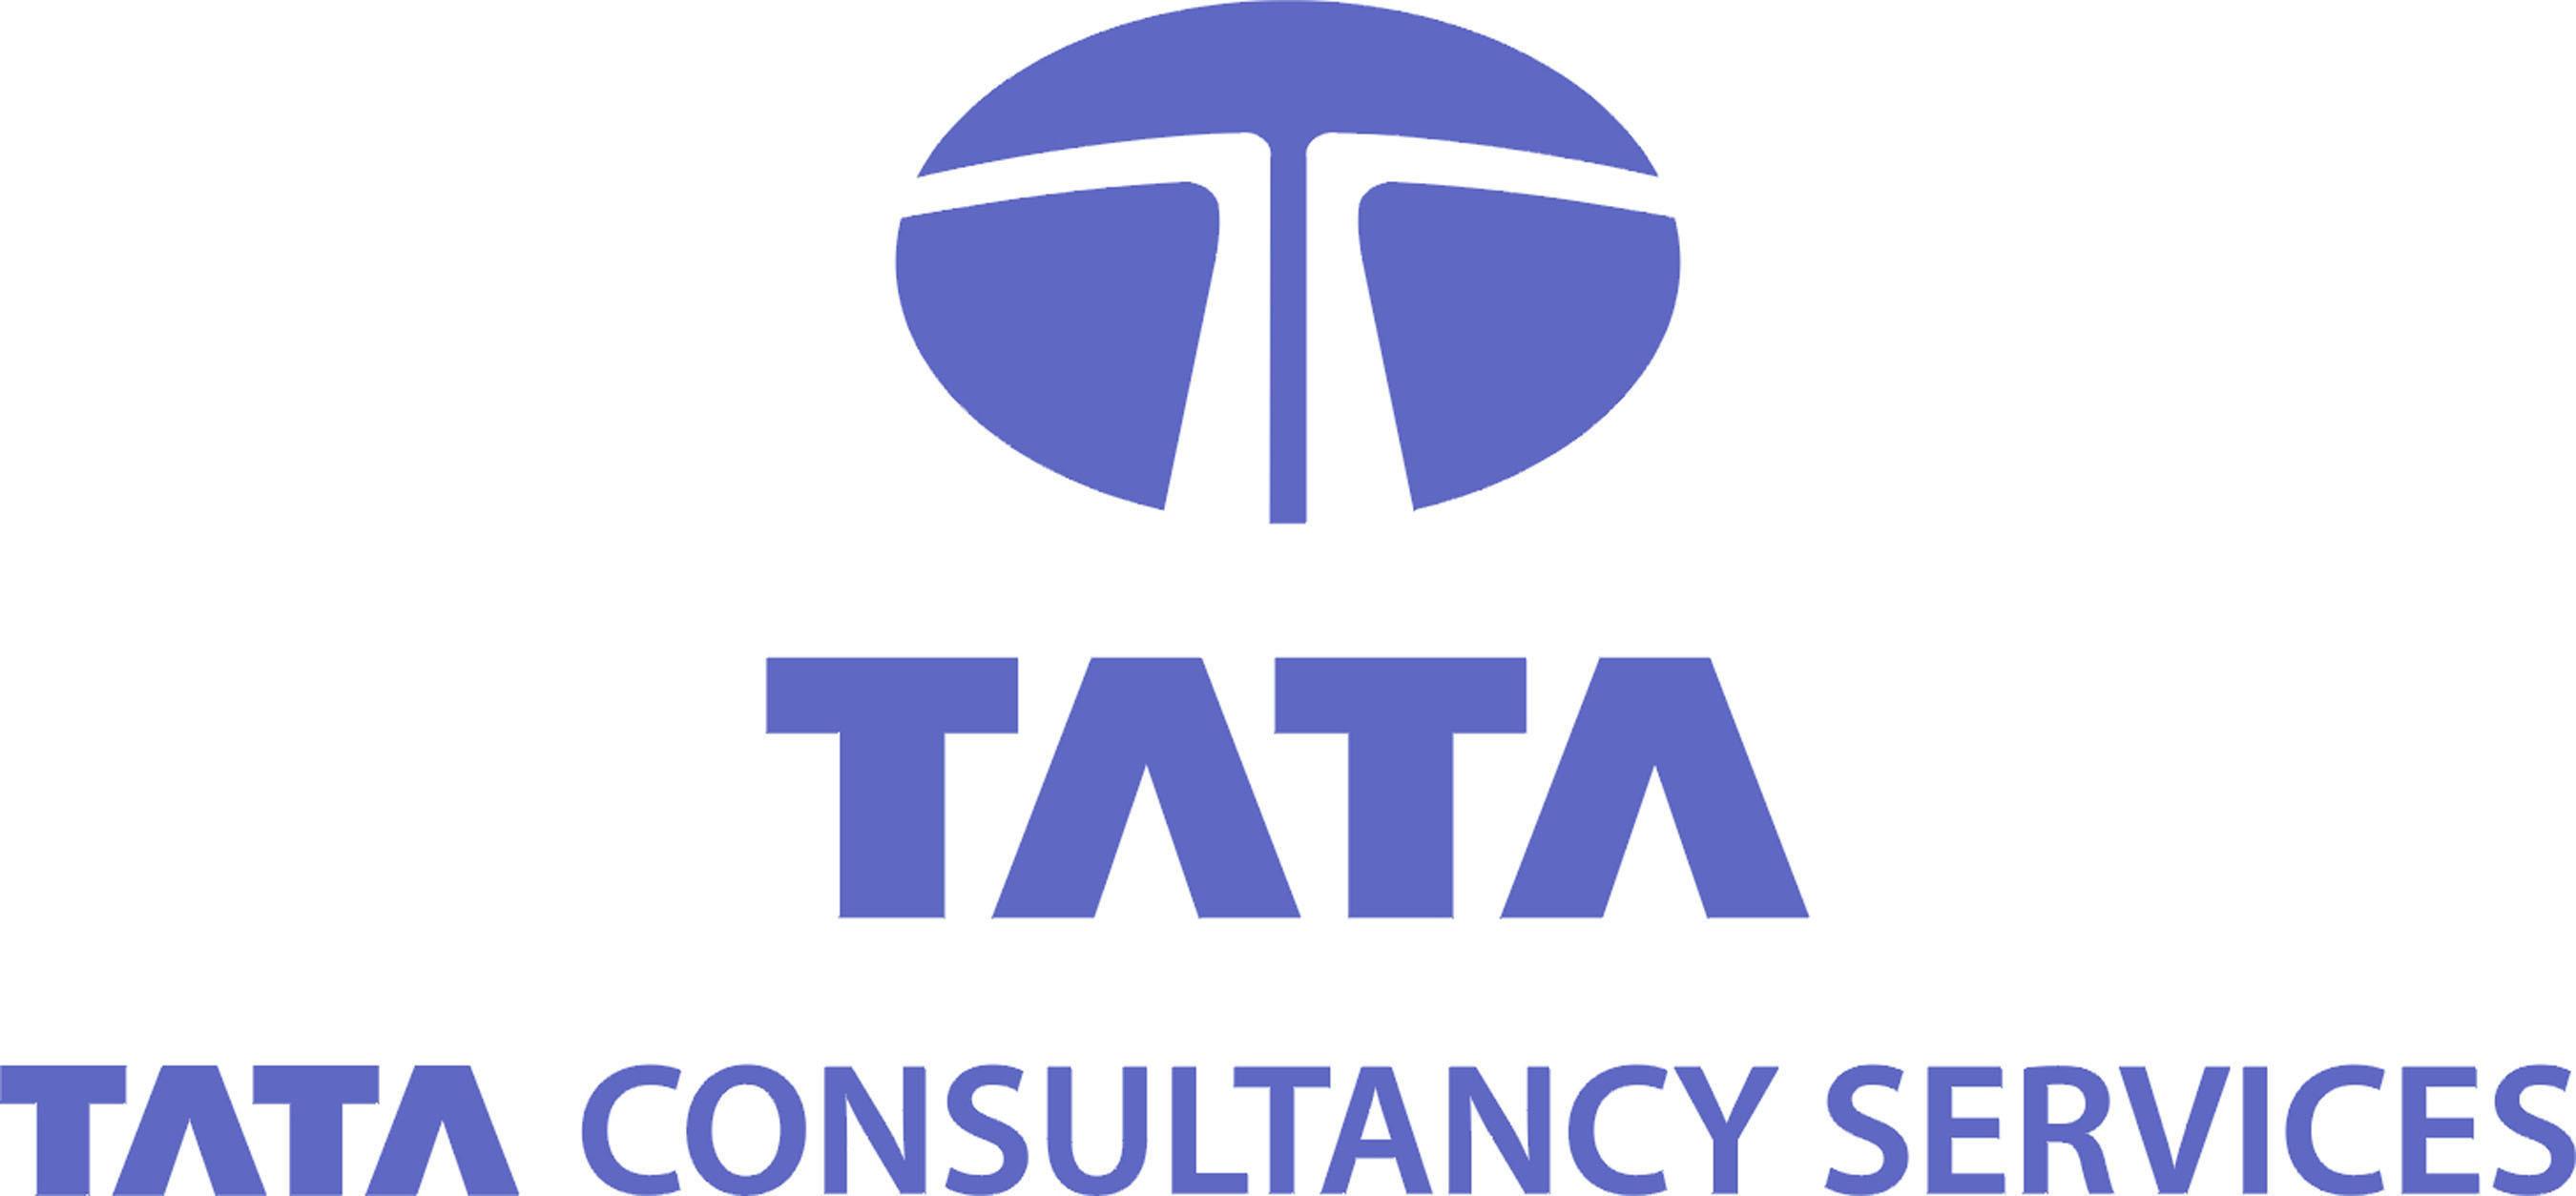 Tata Consultancy Services.